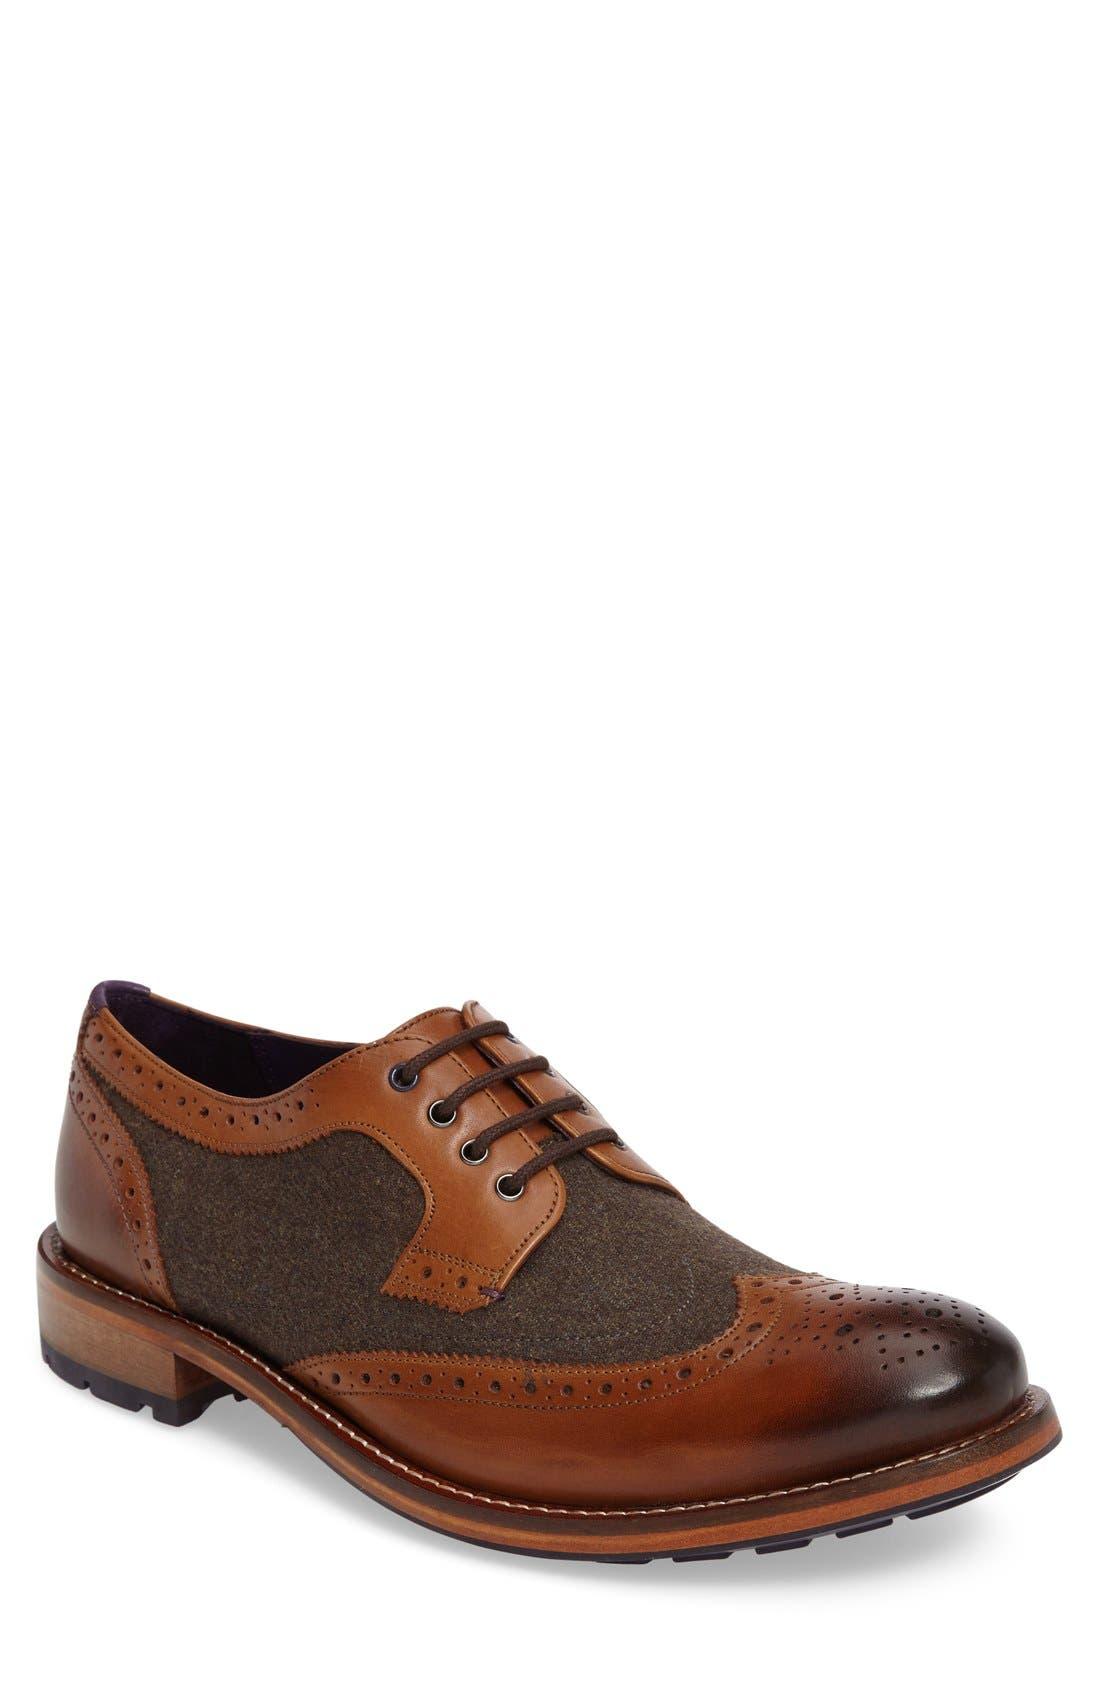 'Cassiuss 4' Wingtip,                         Main,                         color, Tan/ Brown Leather